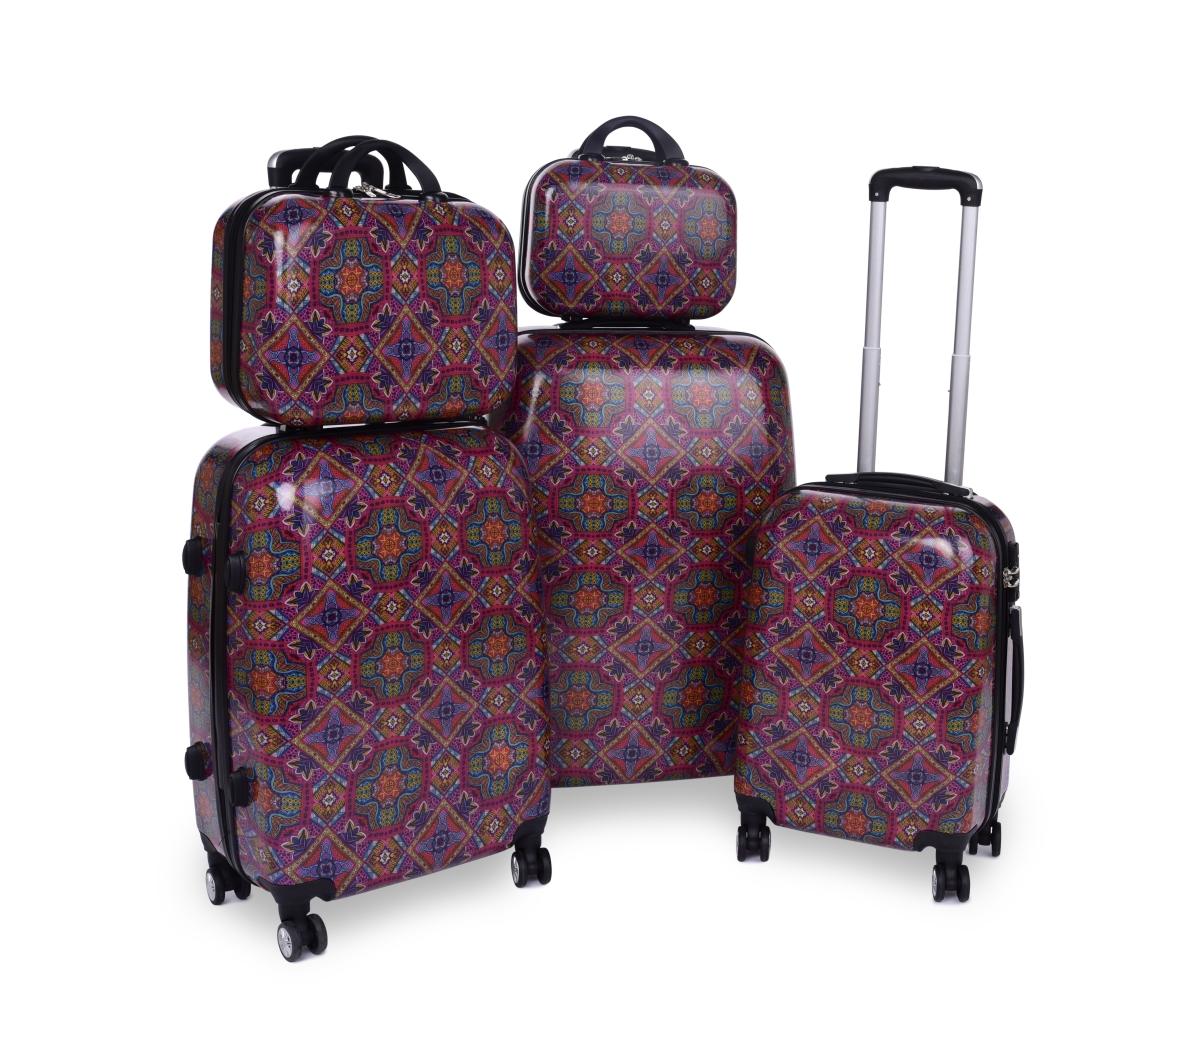 FC20765-TSA kufor veľký MANDALA ORNAMENTS 50 x 30 x 70 cm